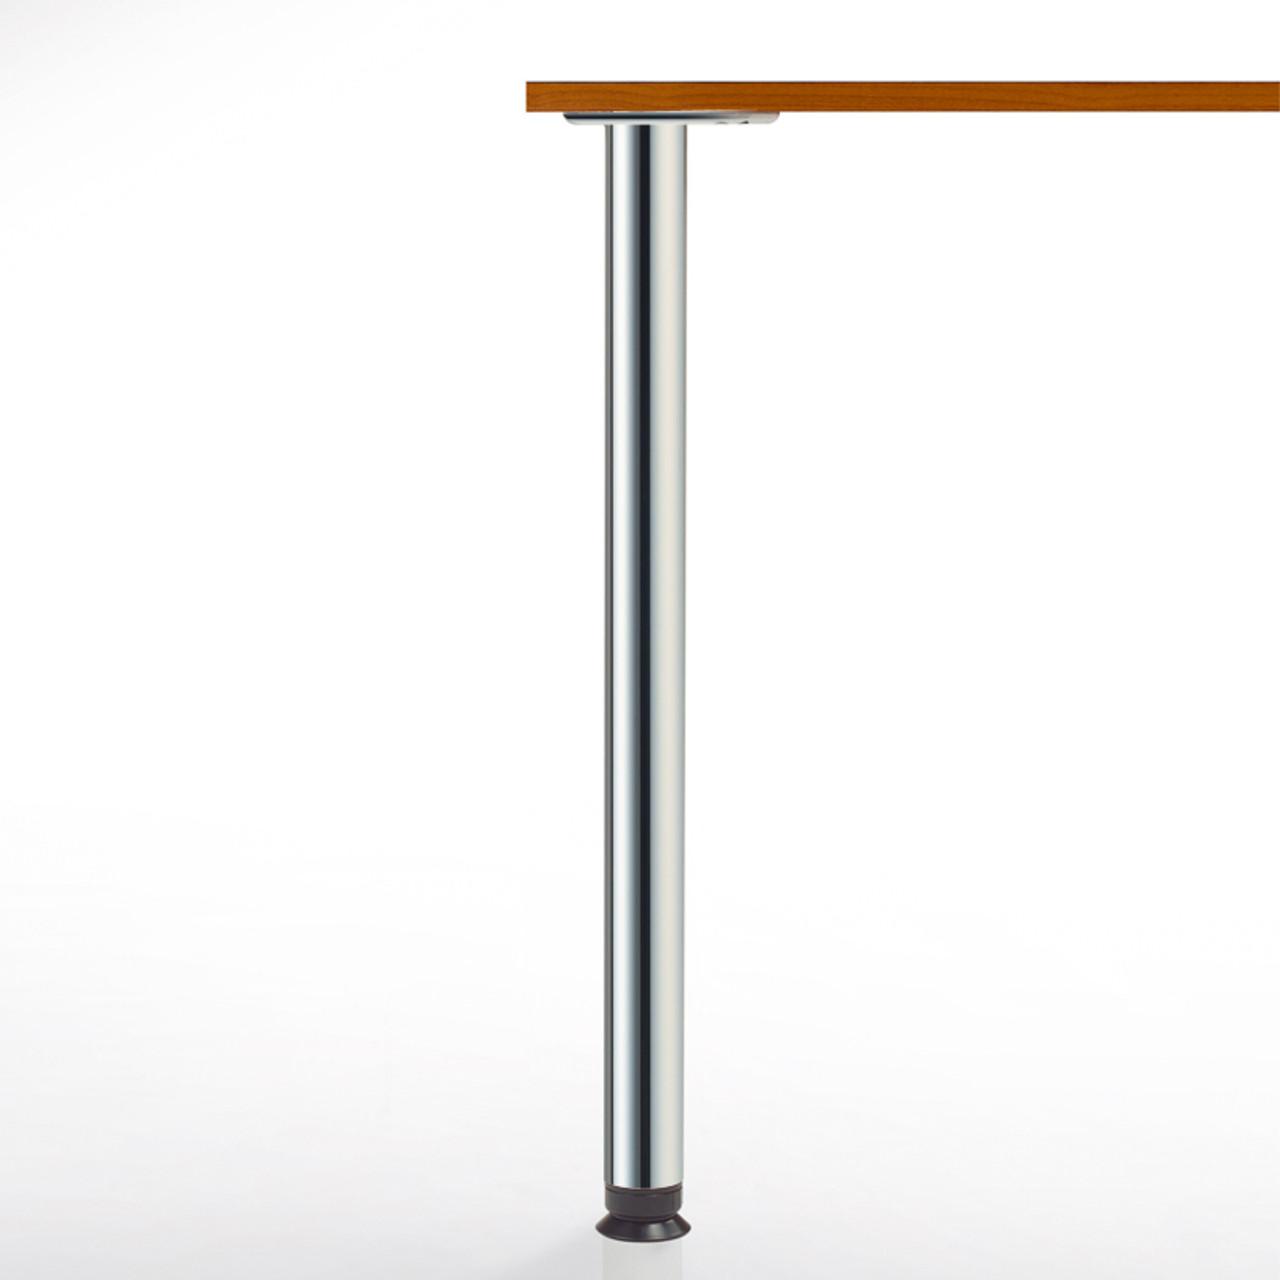 Zoom Table Leg, 27-3/4'', 2-3/8'' diameter leg 4'' adjustable foot - replacementtablelegs.com